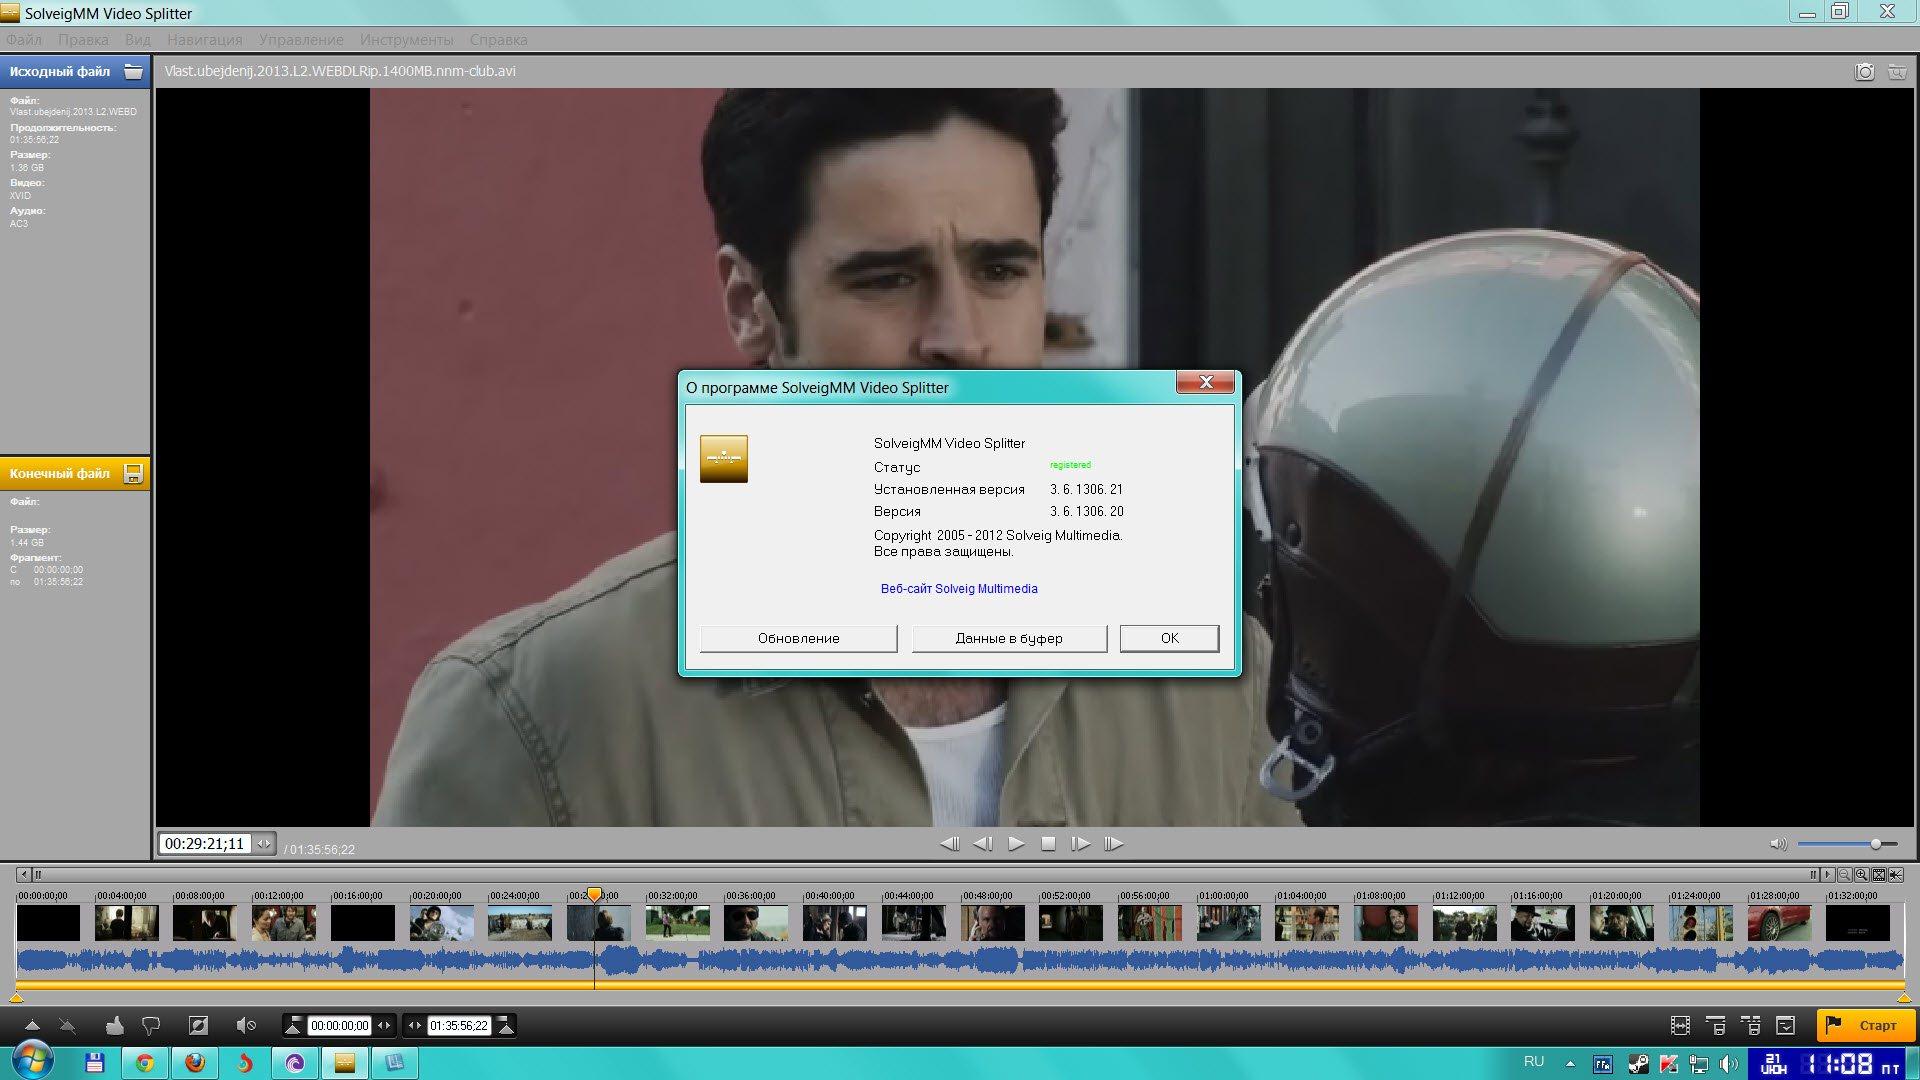 Разработчик. Разрядность. SolveigMM Video Splitter v3.6.1306.21